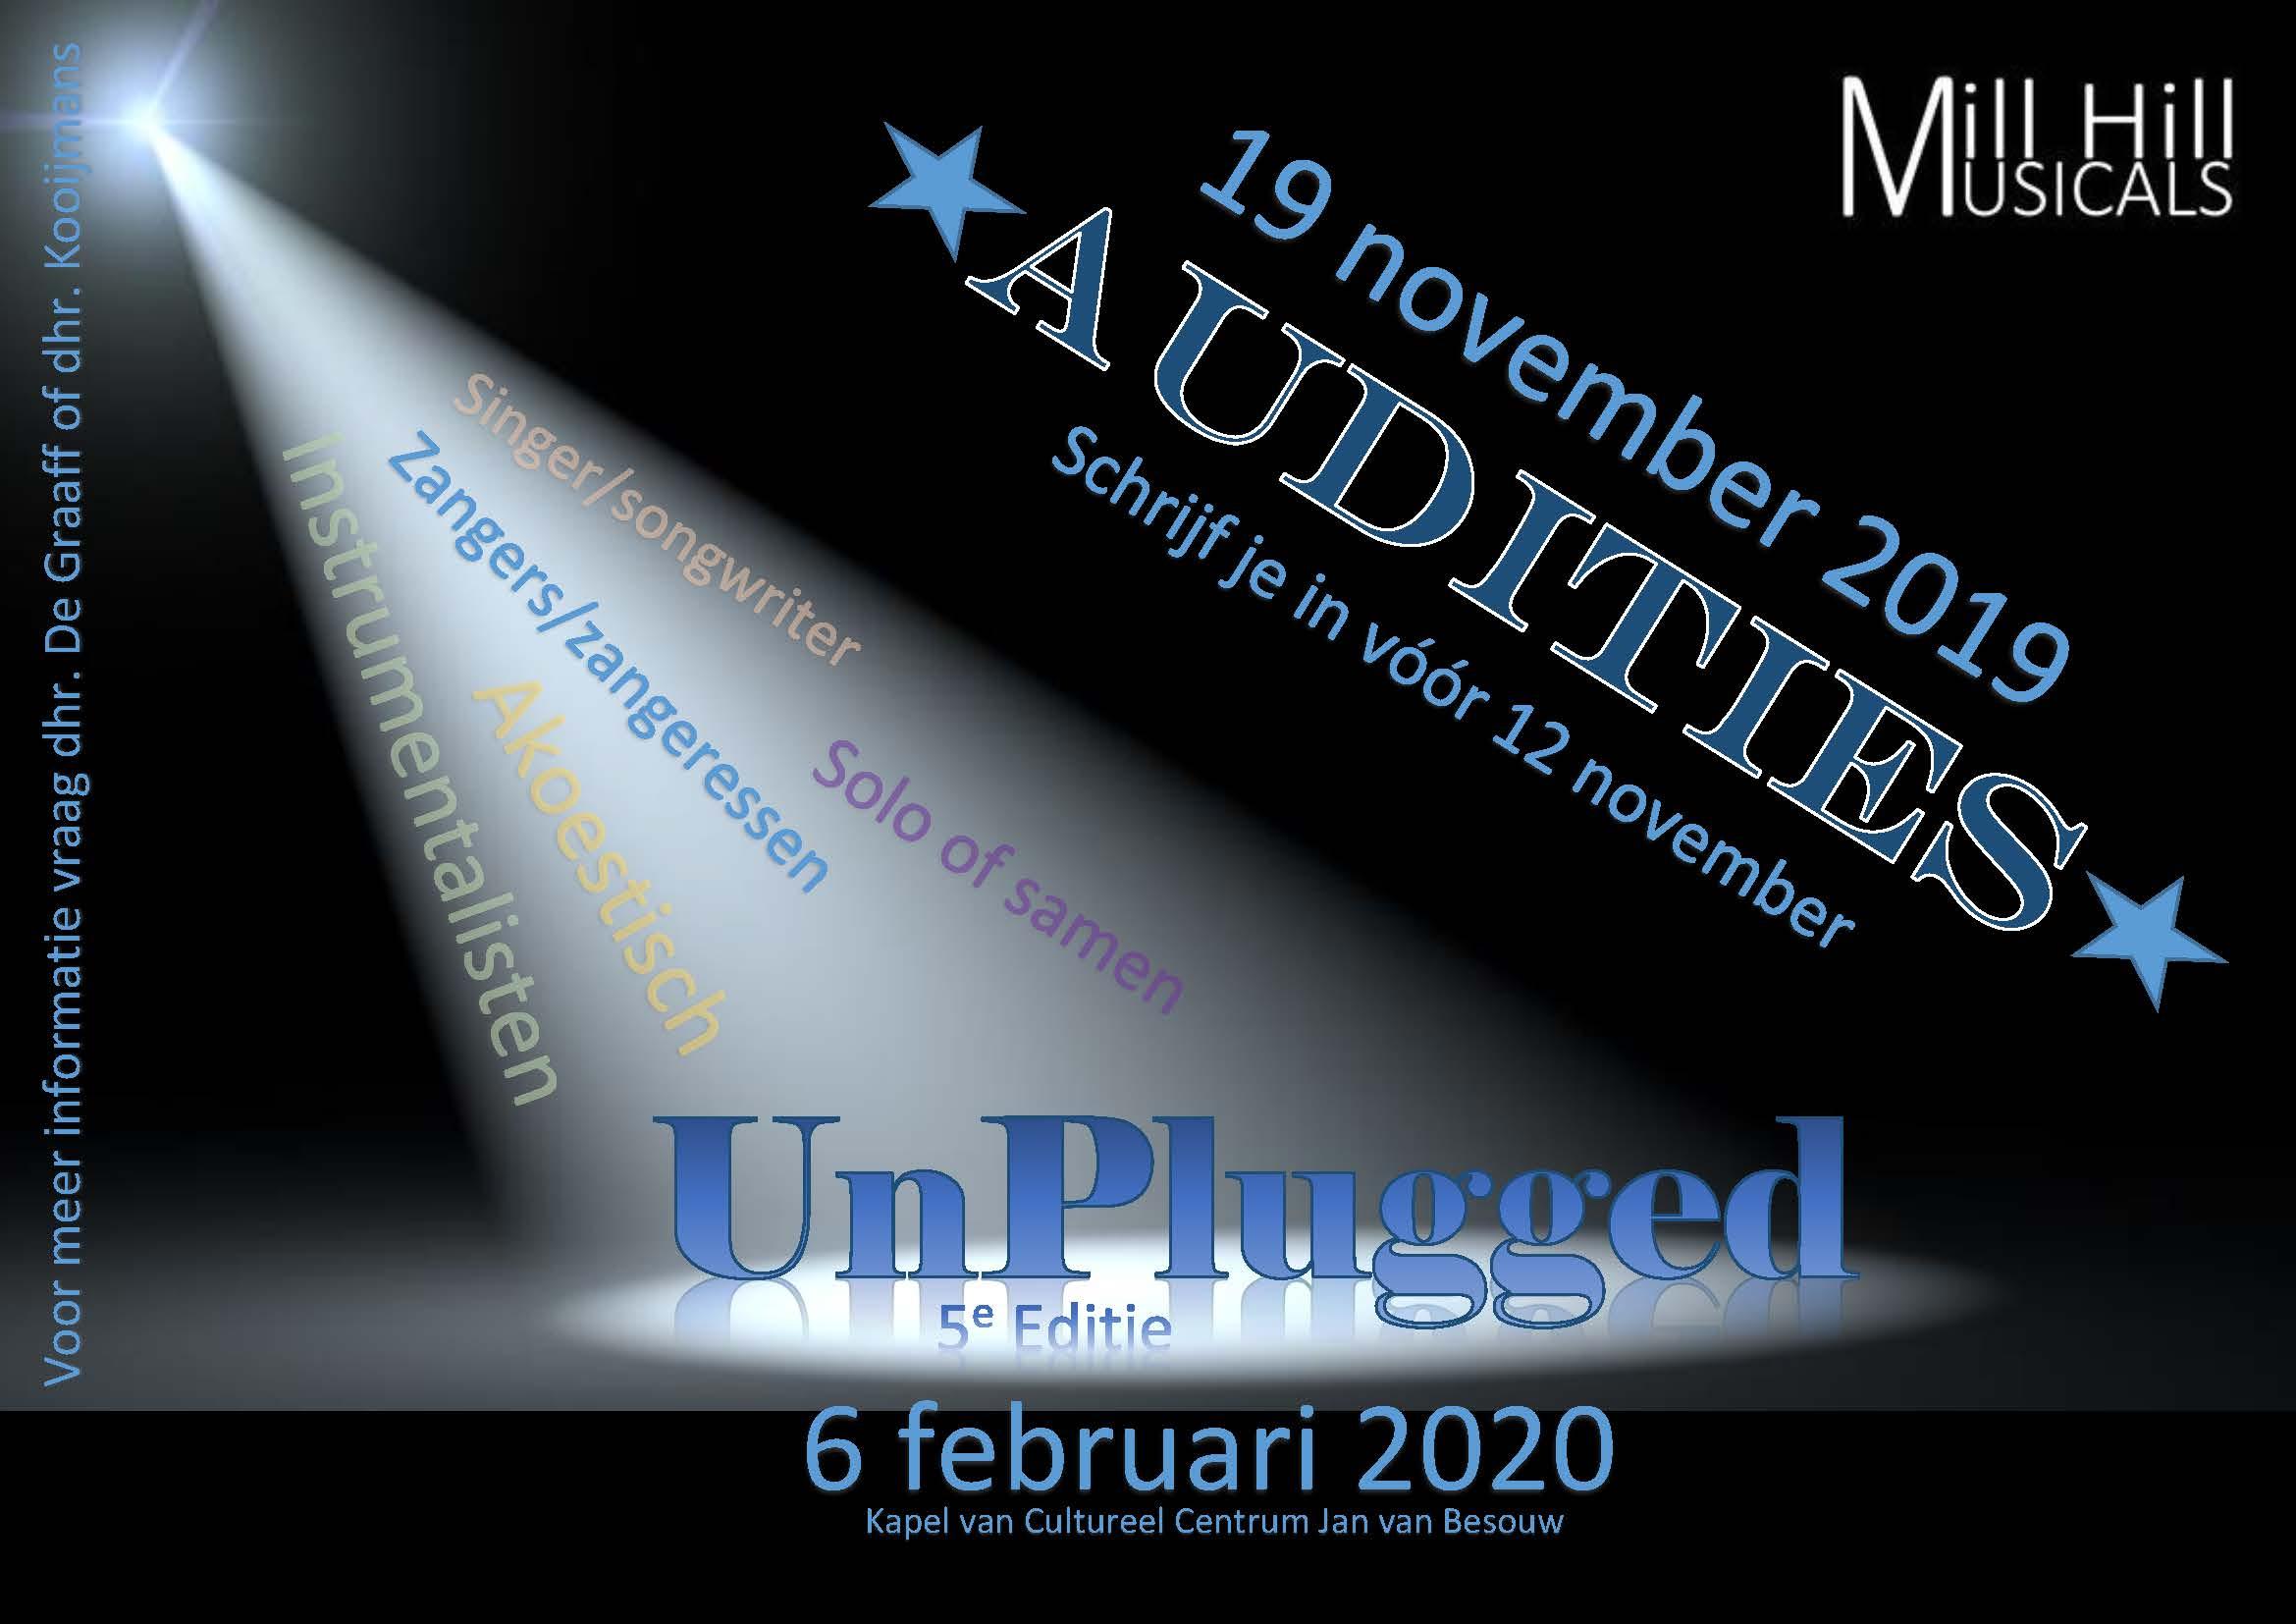 AUDITIES  Unplugged, editie #5